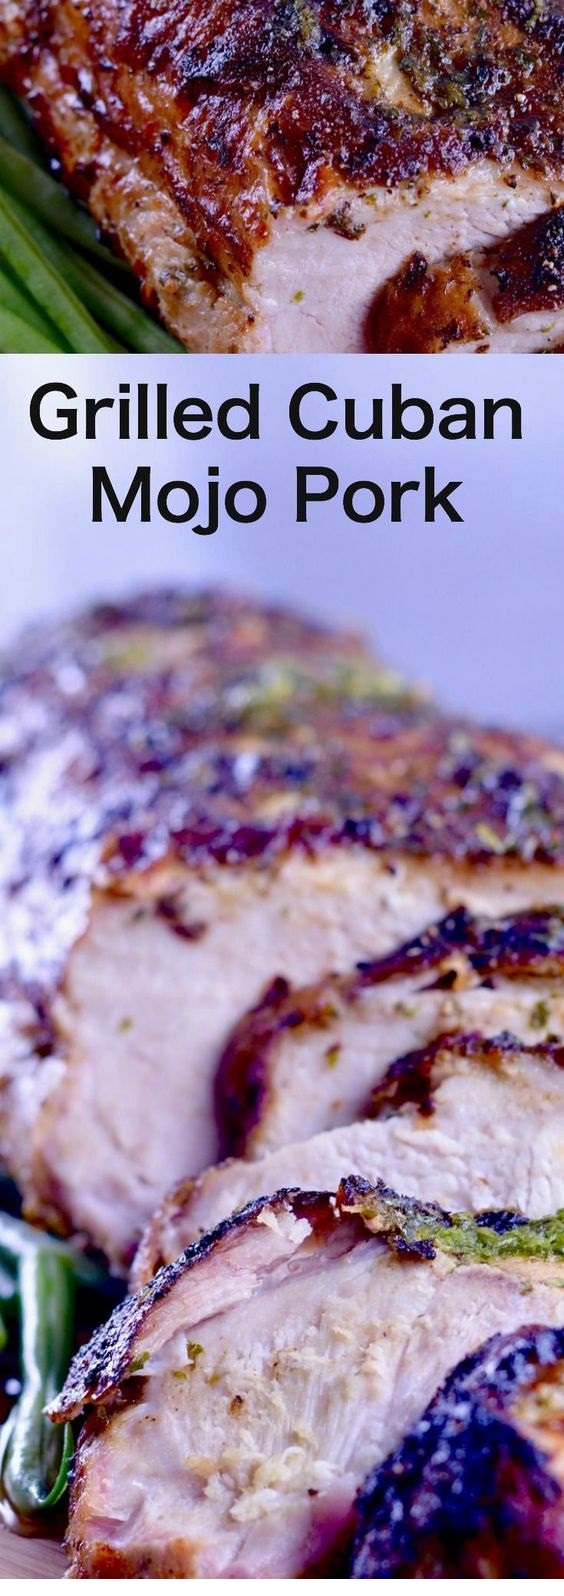 Grilled Cuban Mojo Pork Roast